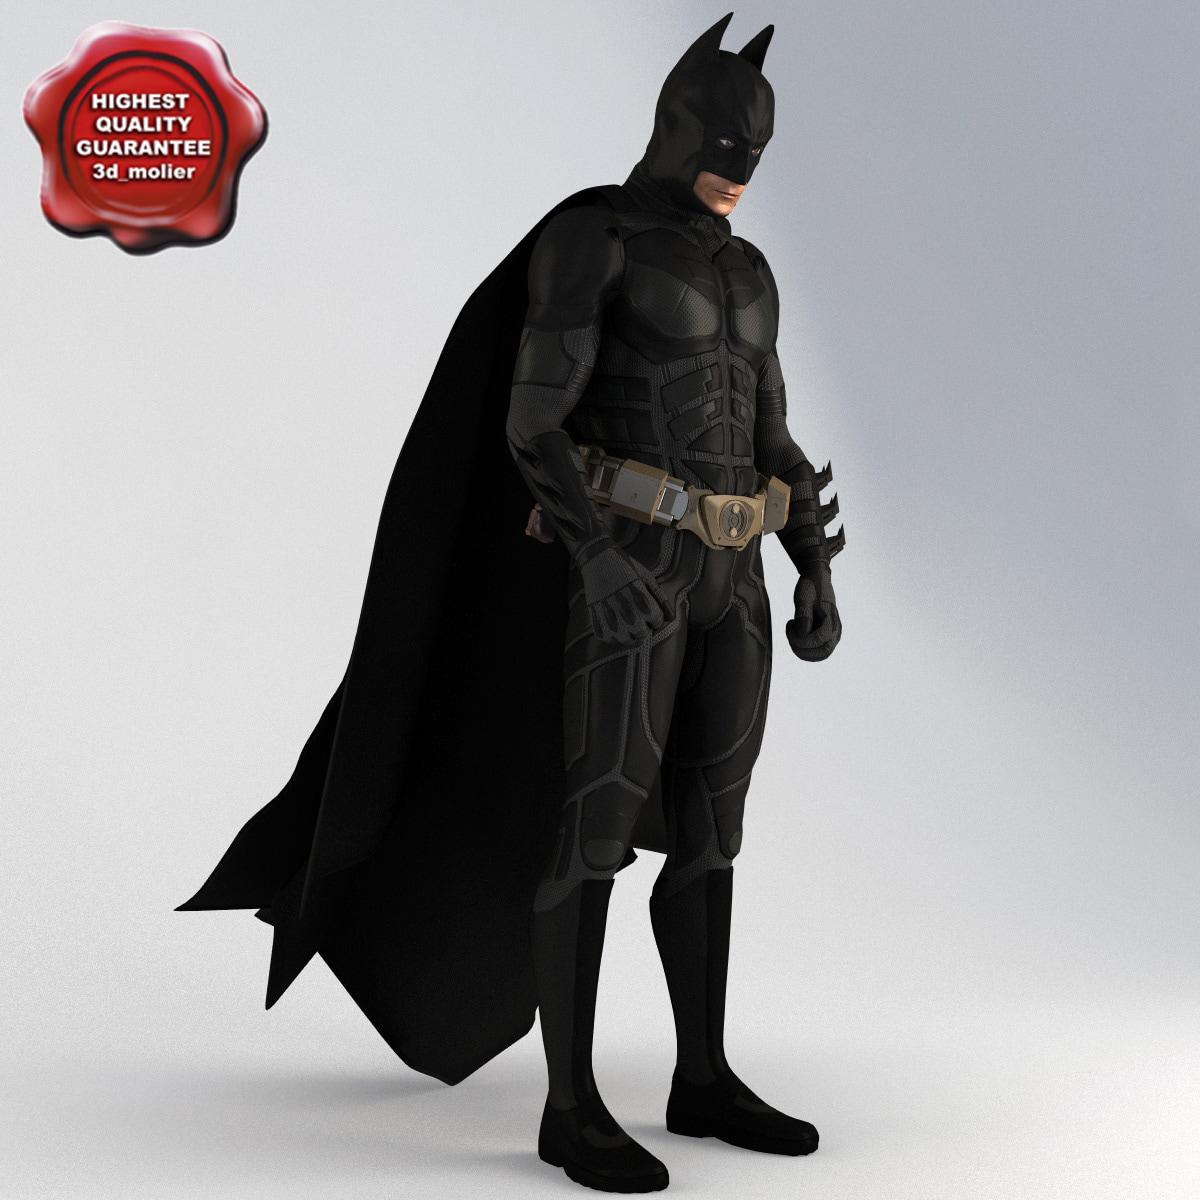 Batman_Pose3_00.jpg